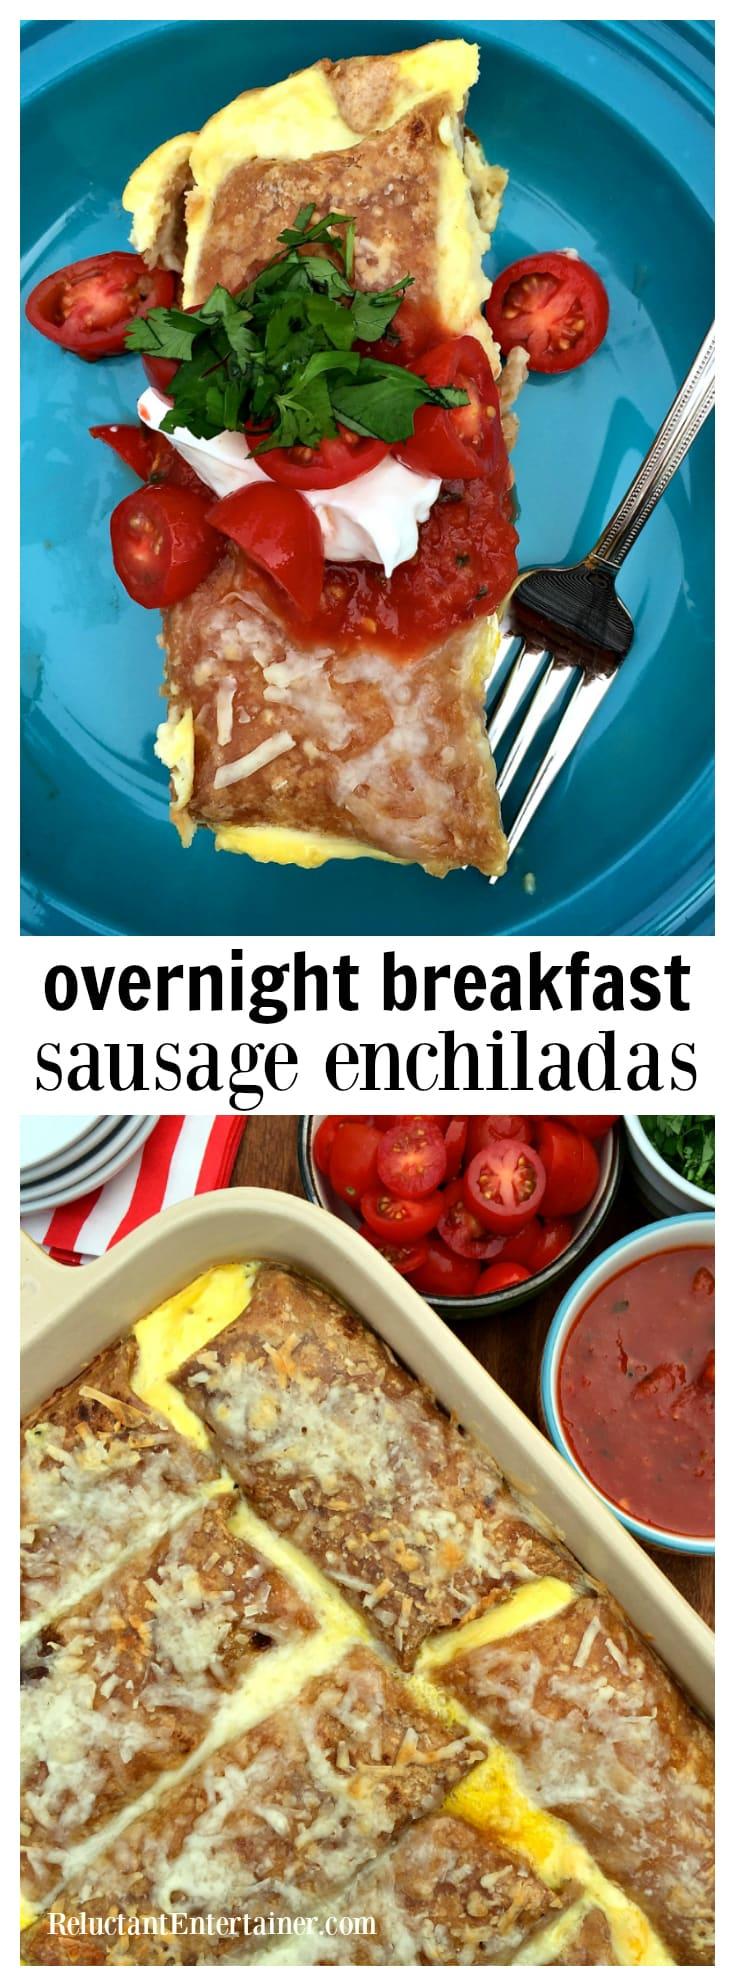 Overnight Breakfast Sausage Enchiladas - Reluctant Entertainer